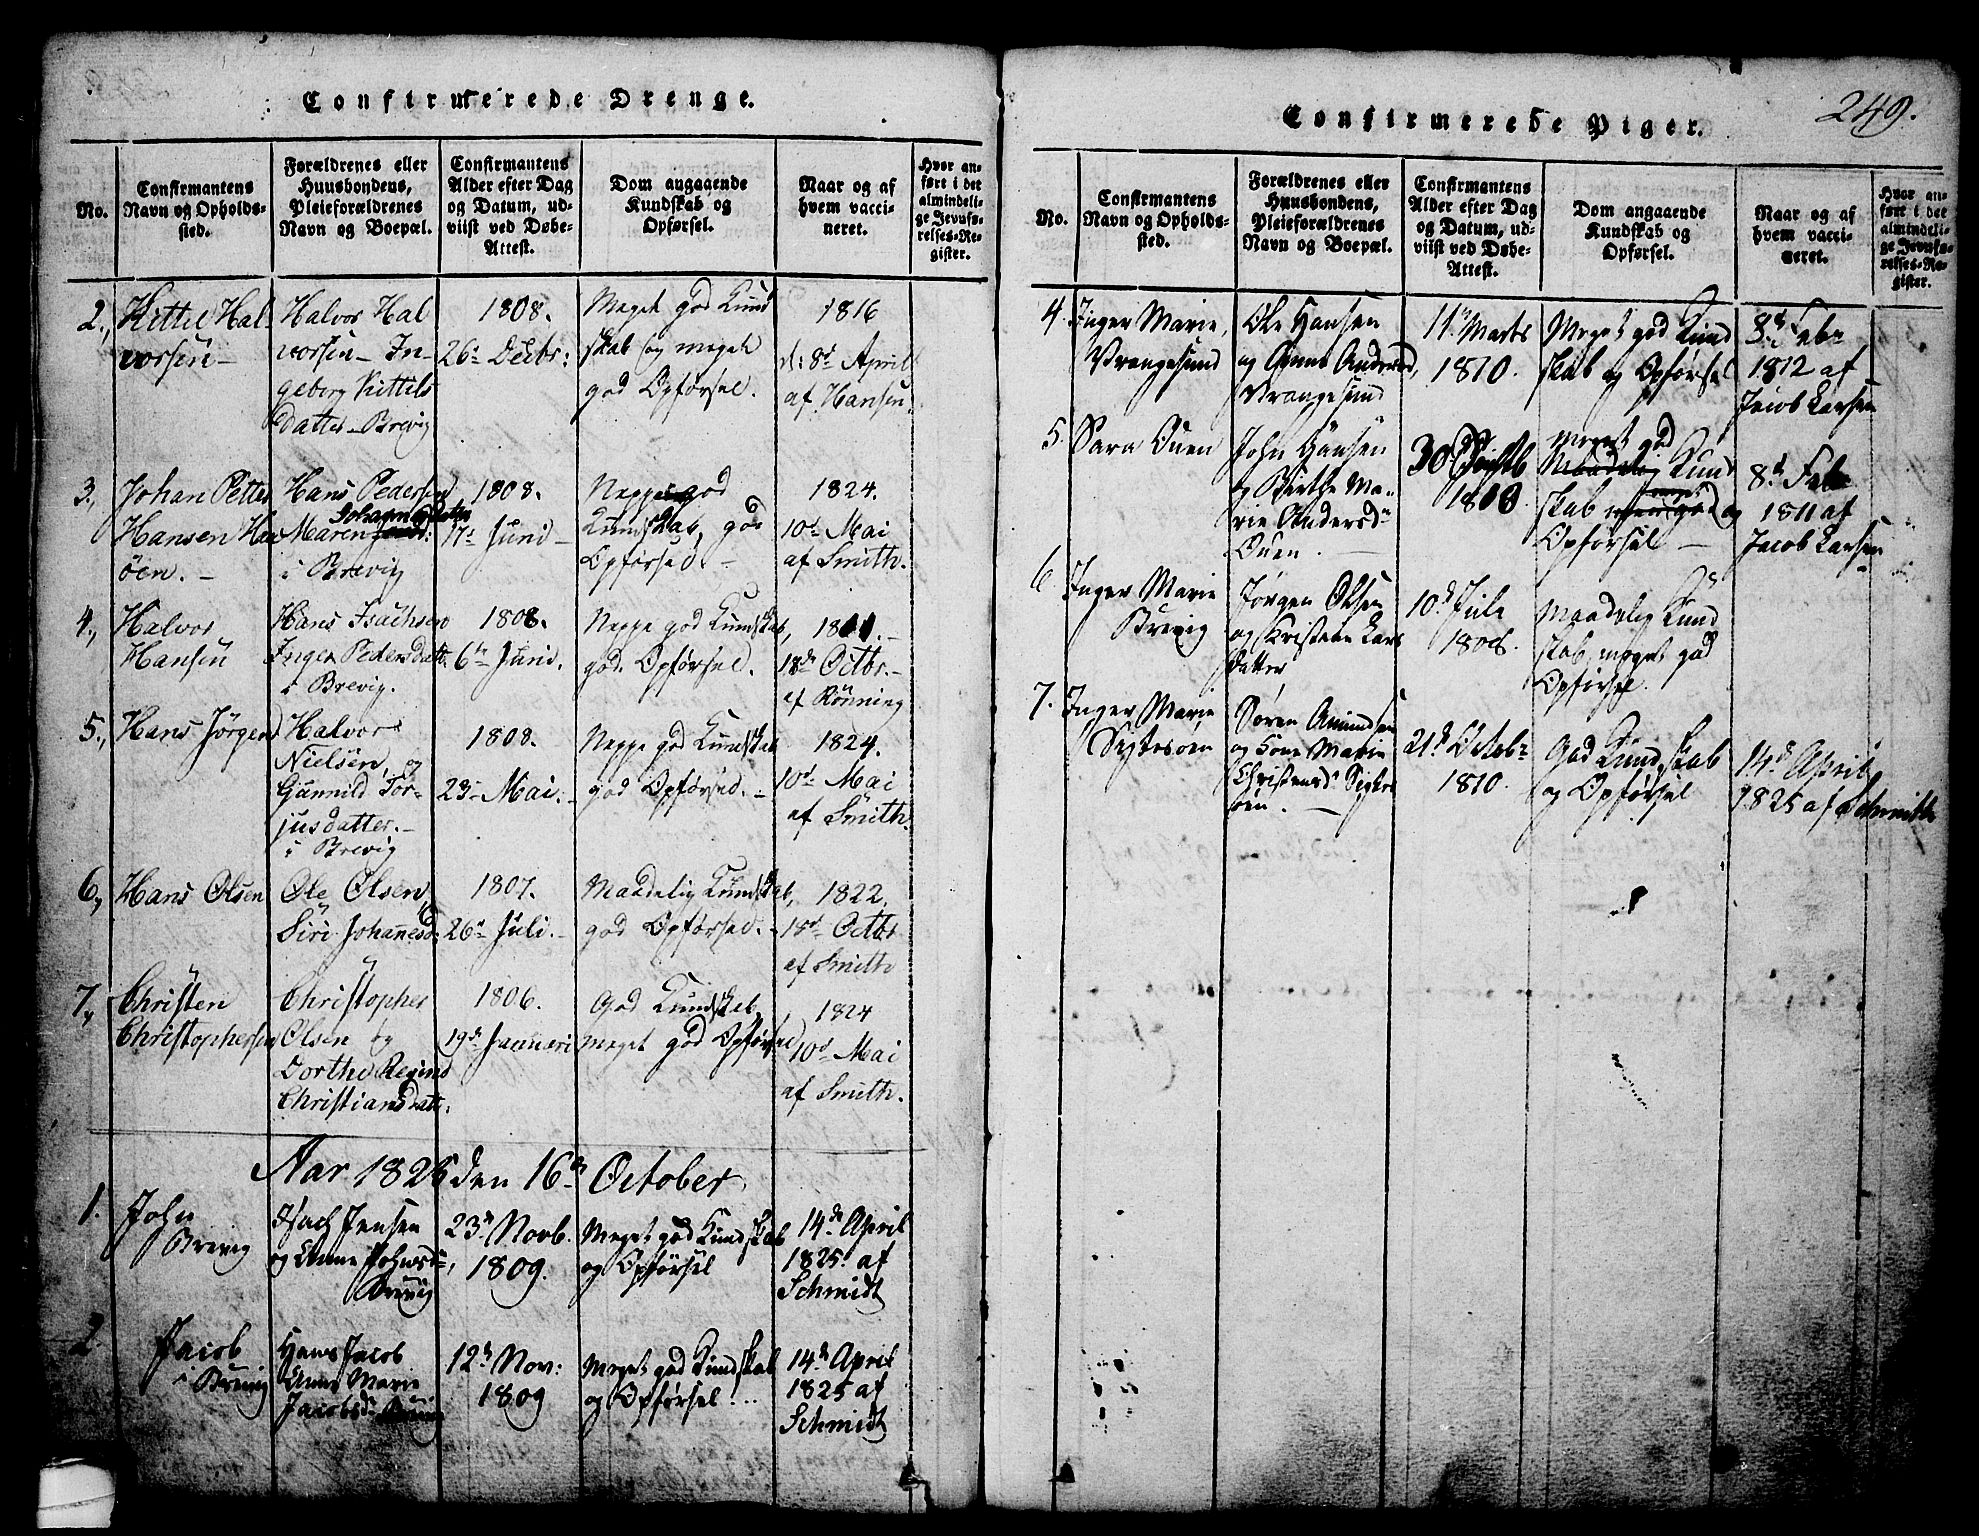 SAKO, Brevik kirkebøker, G/Ga/L0001: Klokkerbok nr. 1, 1814-1845, s. 249